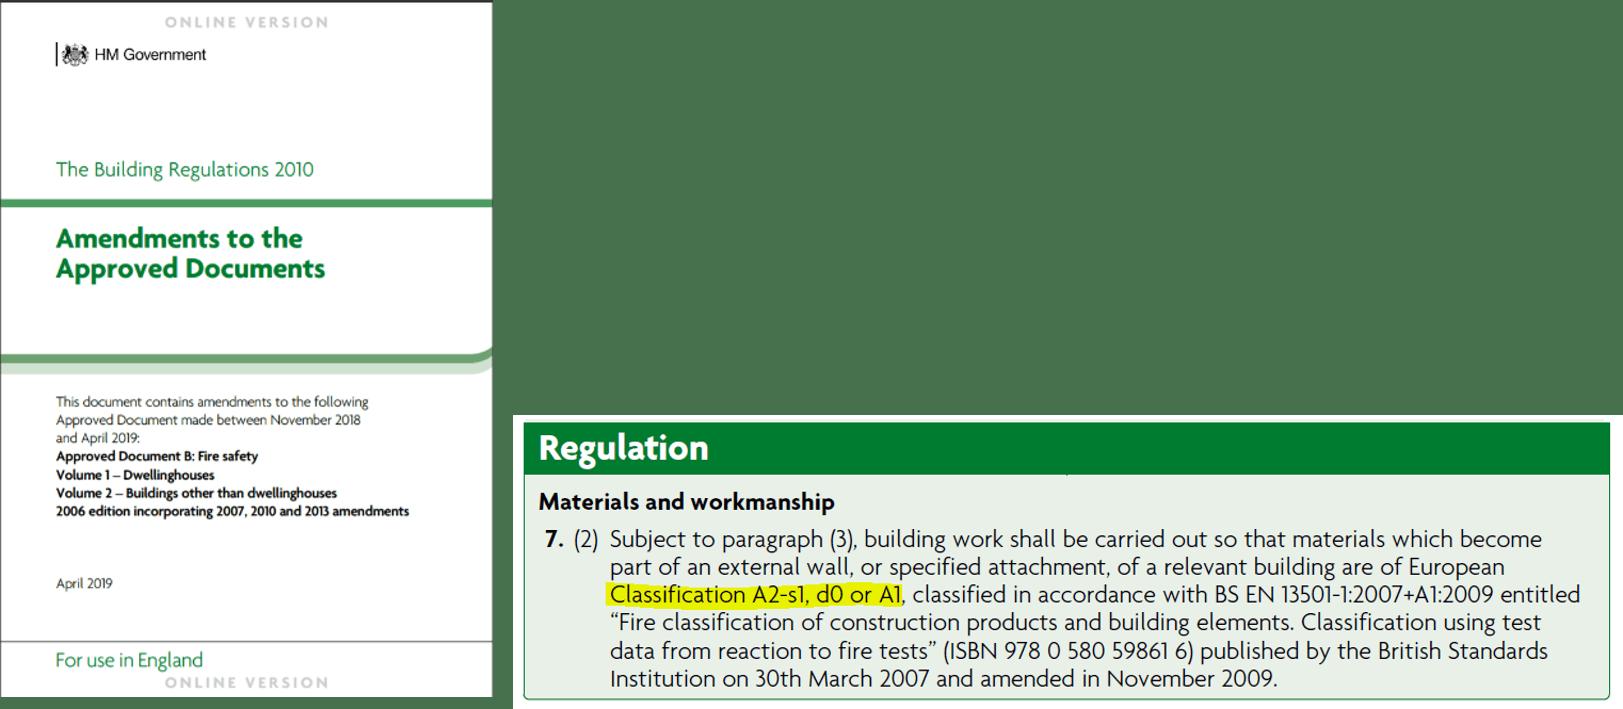 Picture 2.1: Regulations